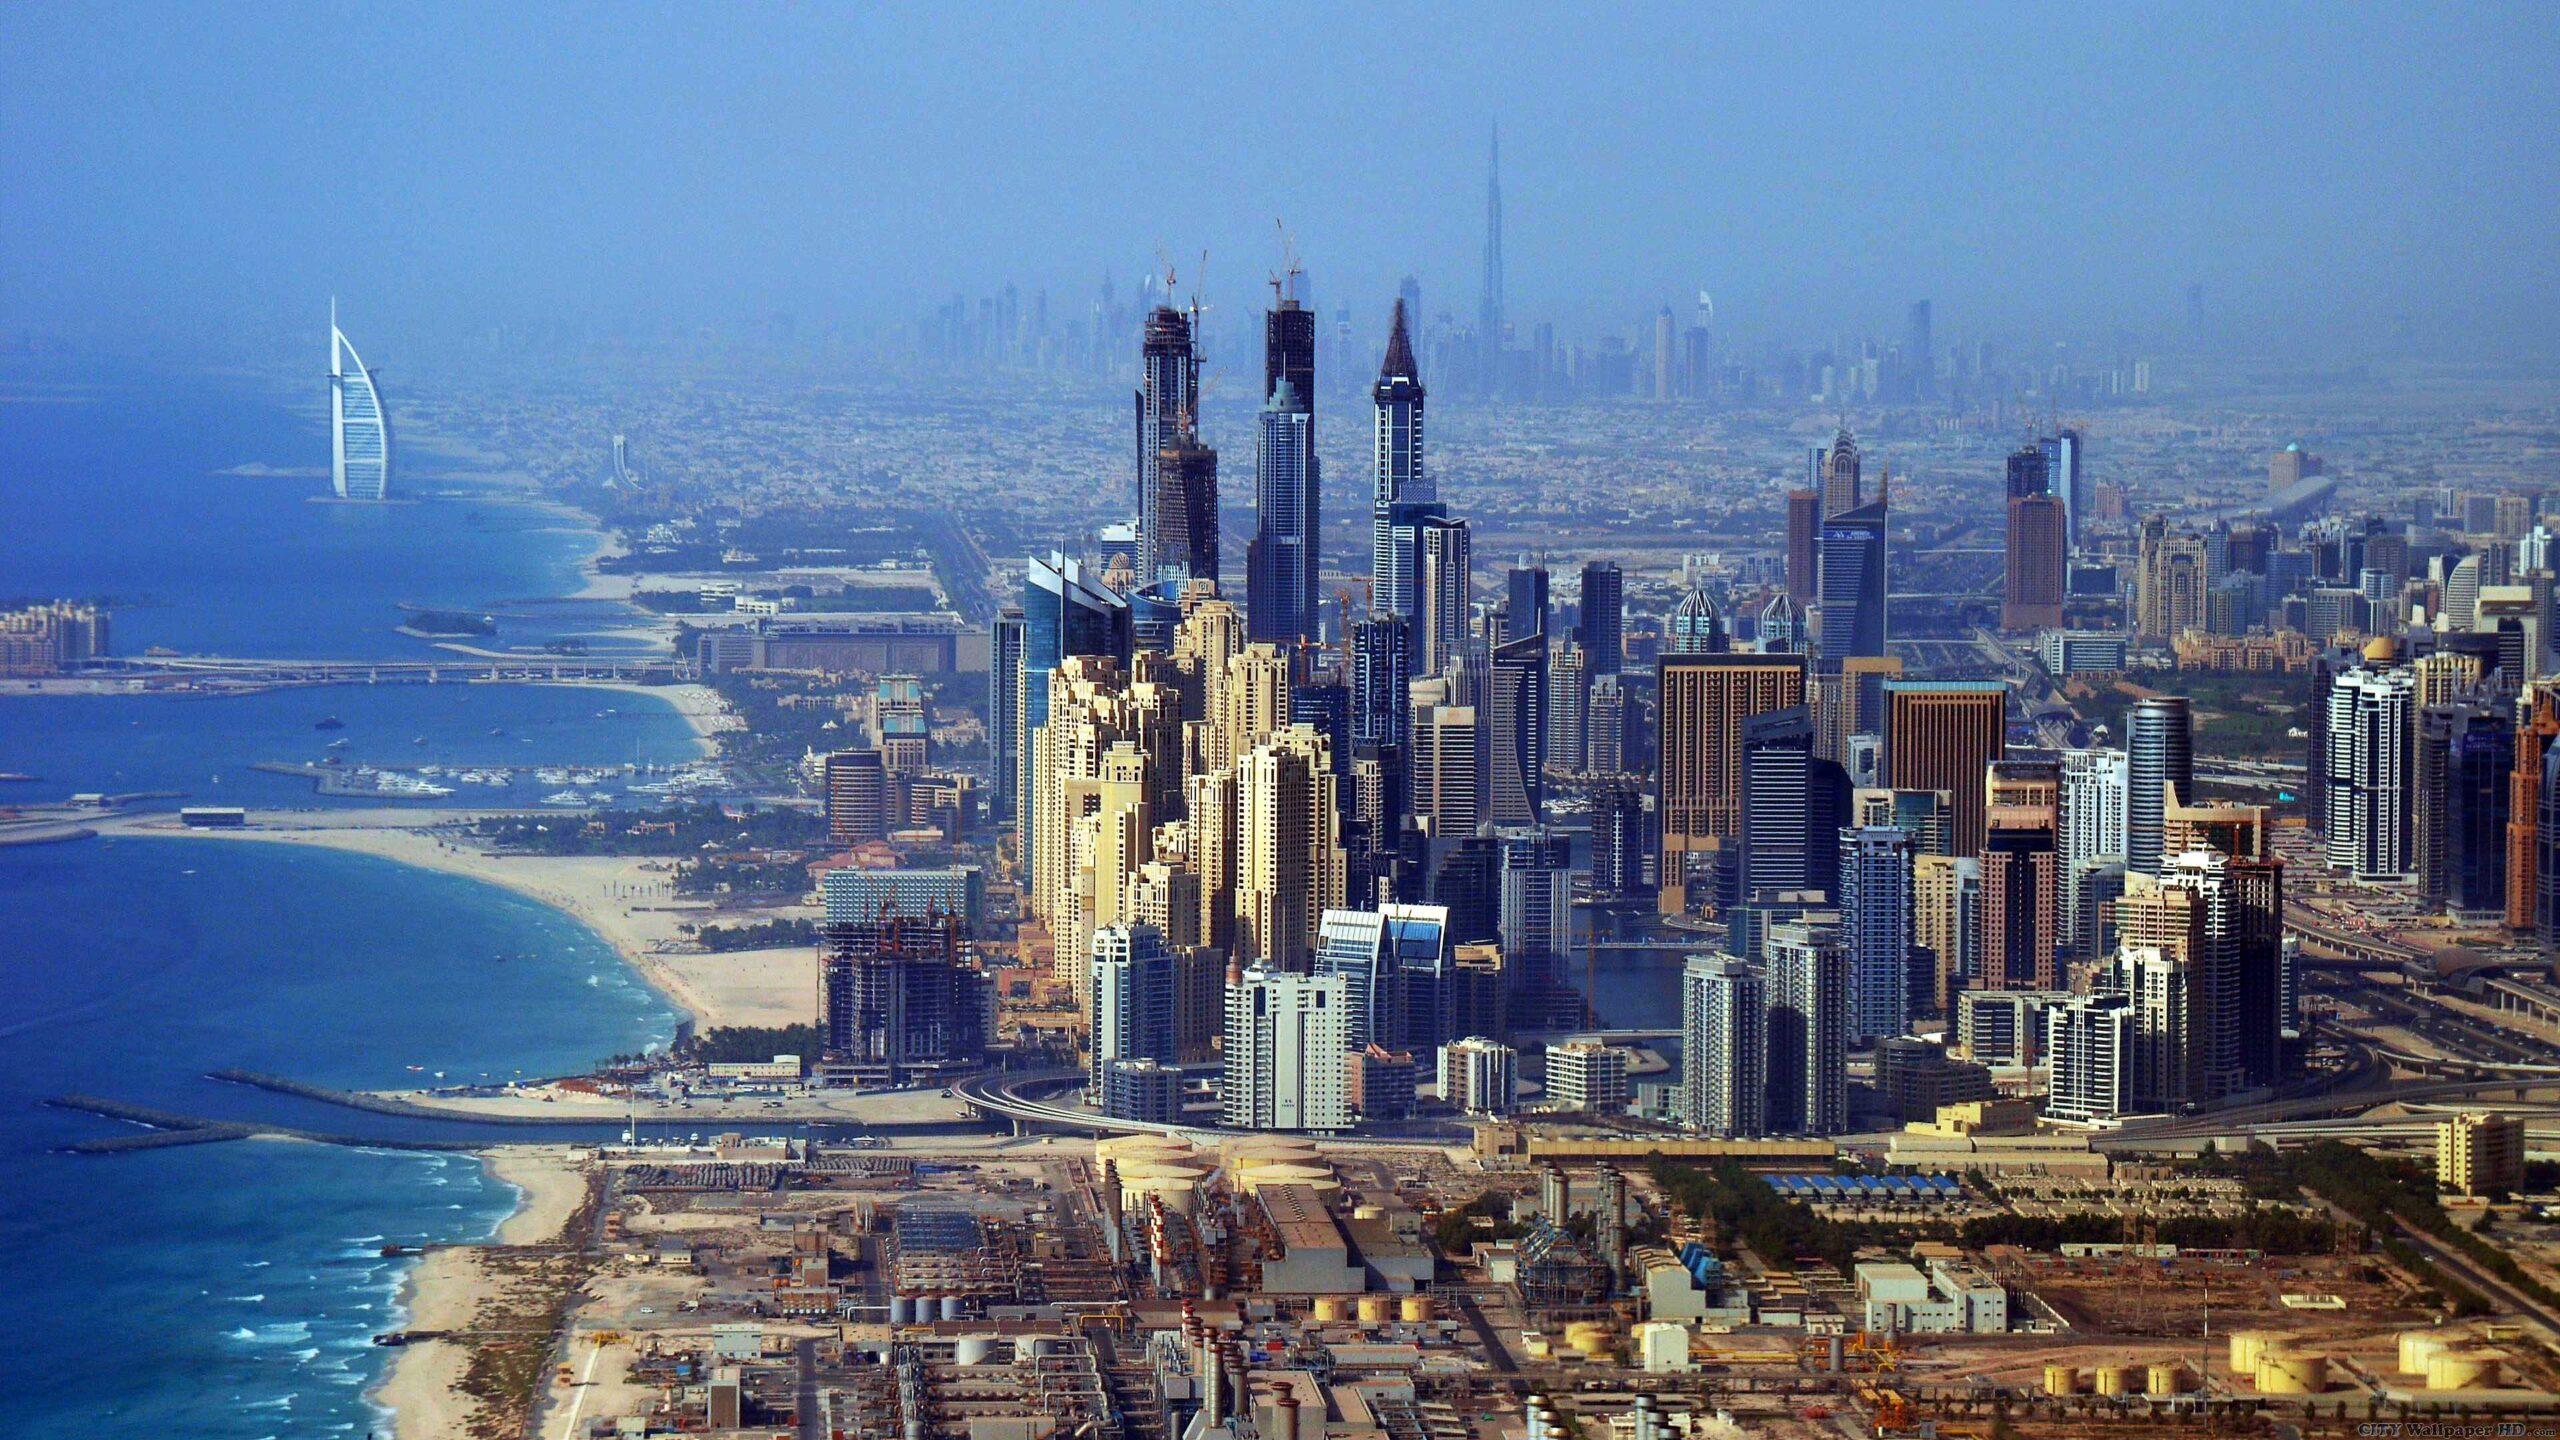 Motorimport importation vehicule dubai importer un vehicule a dubai import auto motorimport14 scaled - Acheter voiture Dubaï ramener France de Dubaï